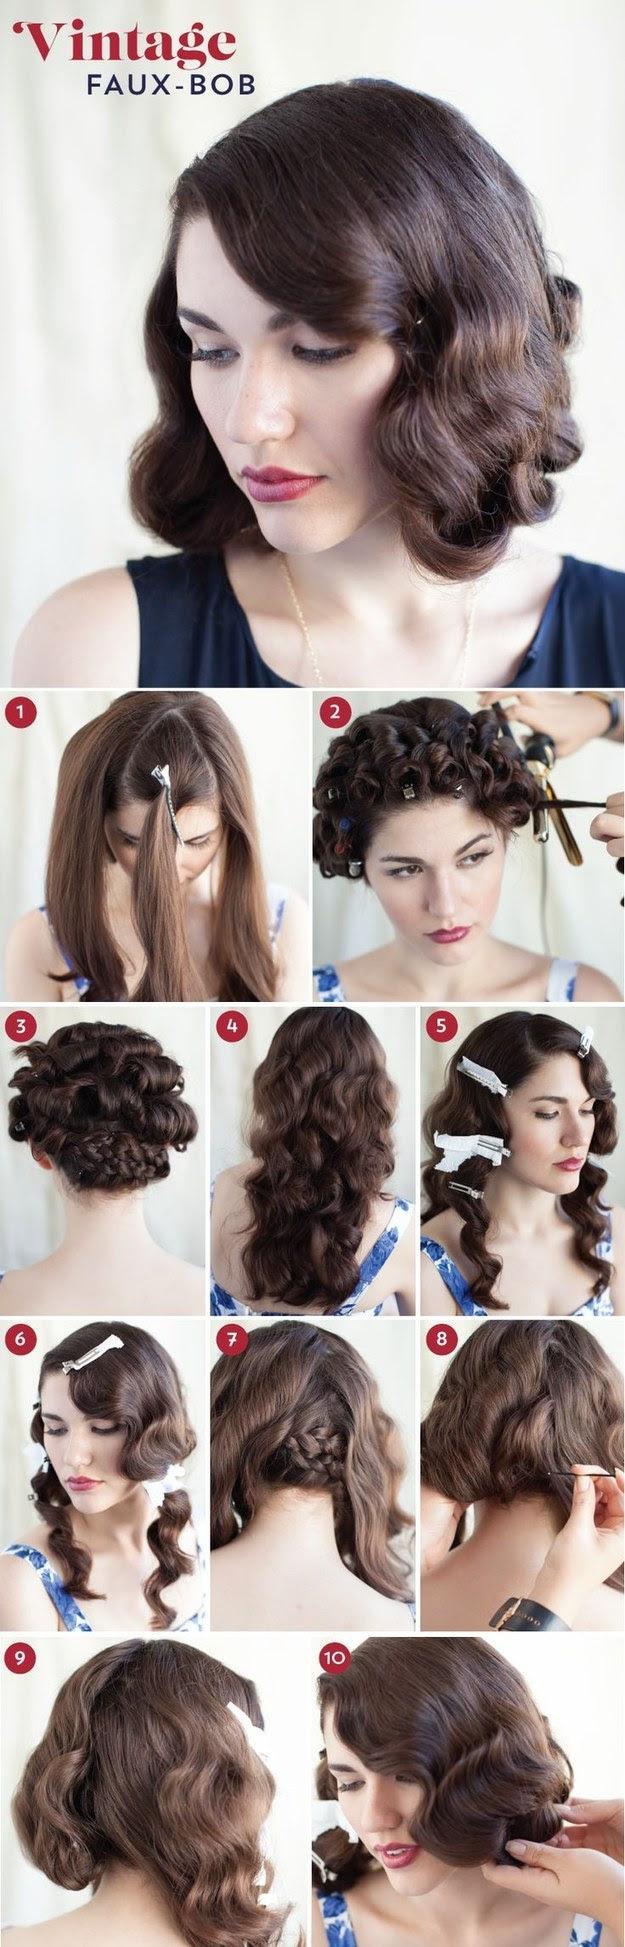 30 DIY Vintage Hairstyle Tutorials For Short Medium Long Hair